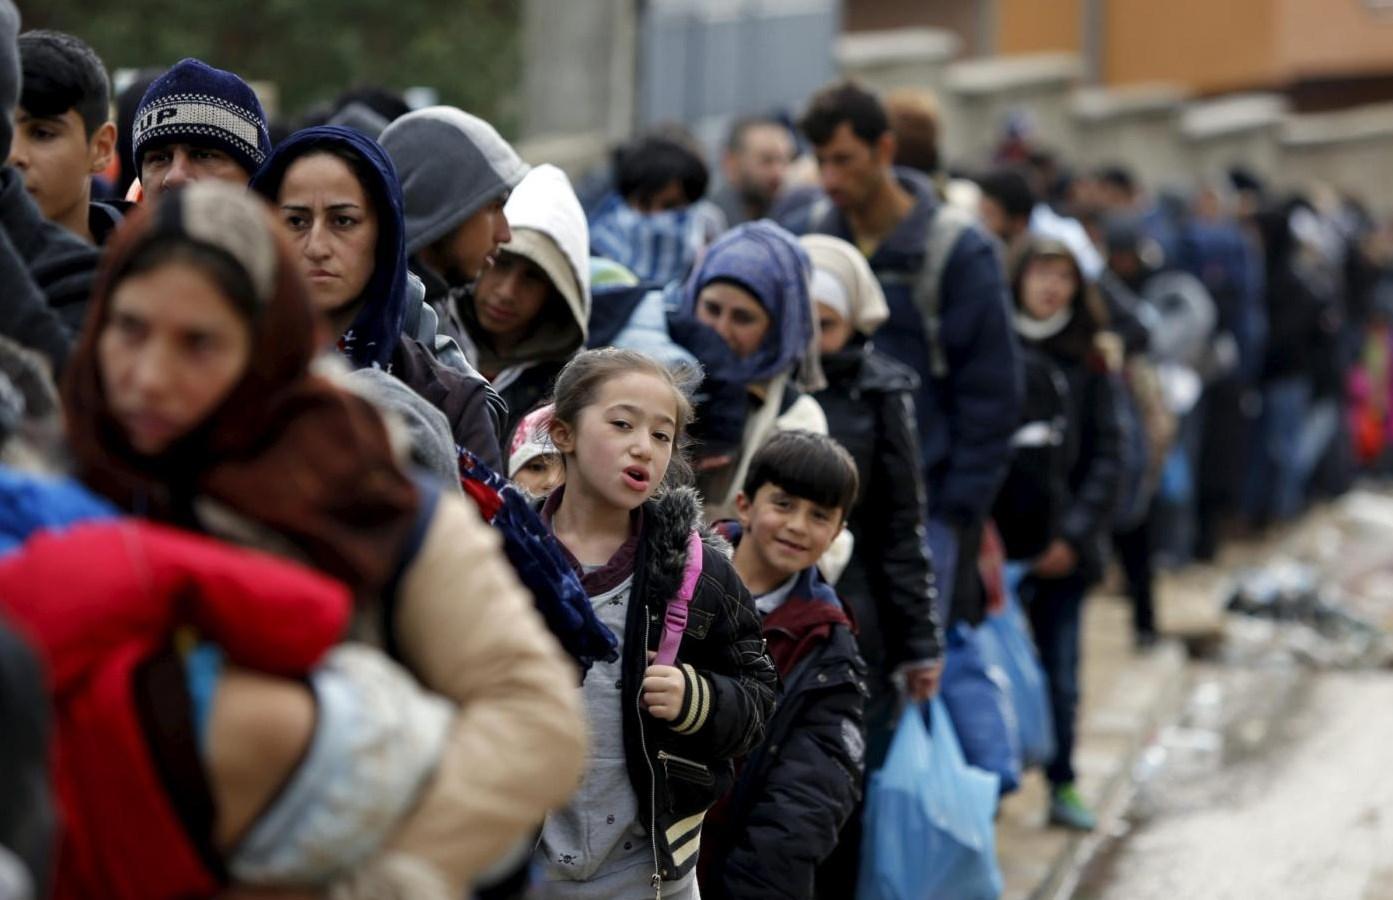 migranti-foto-generica